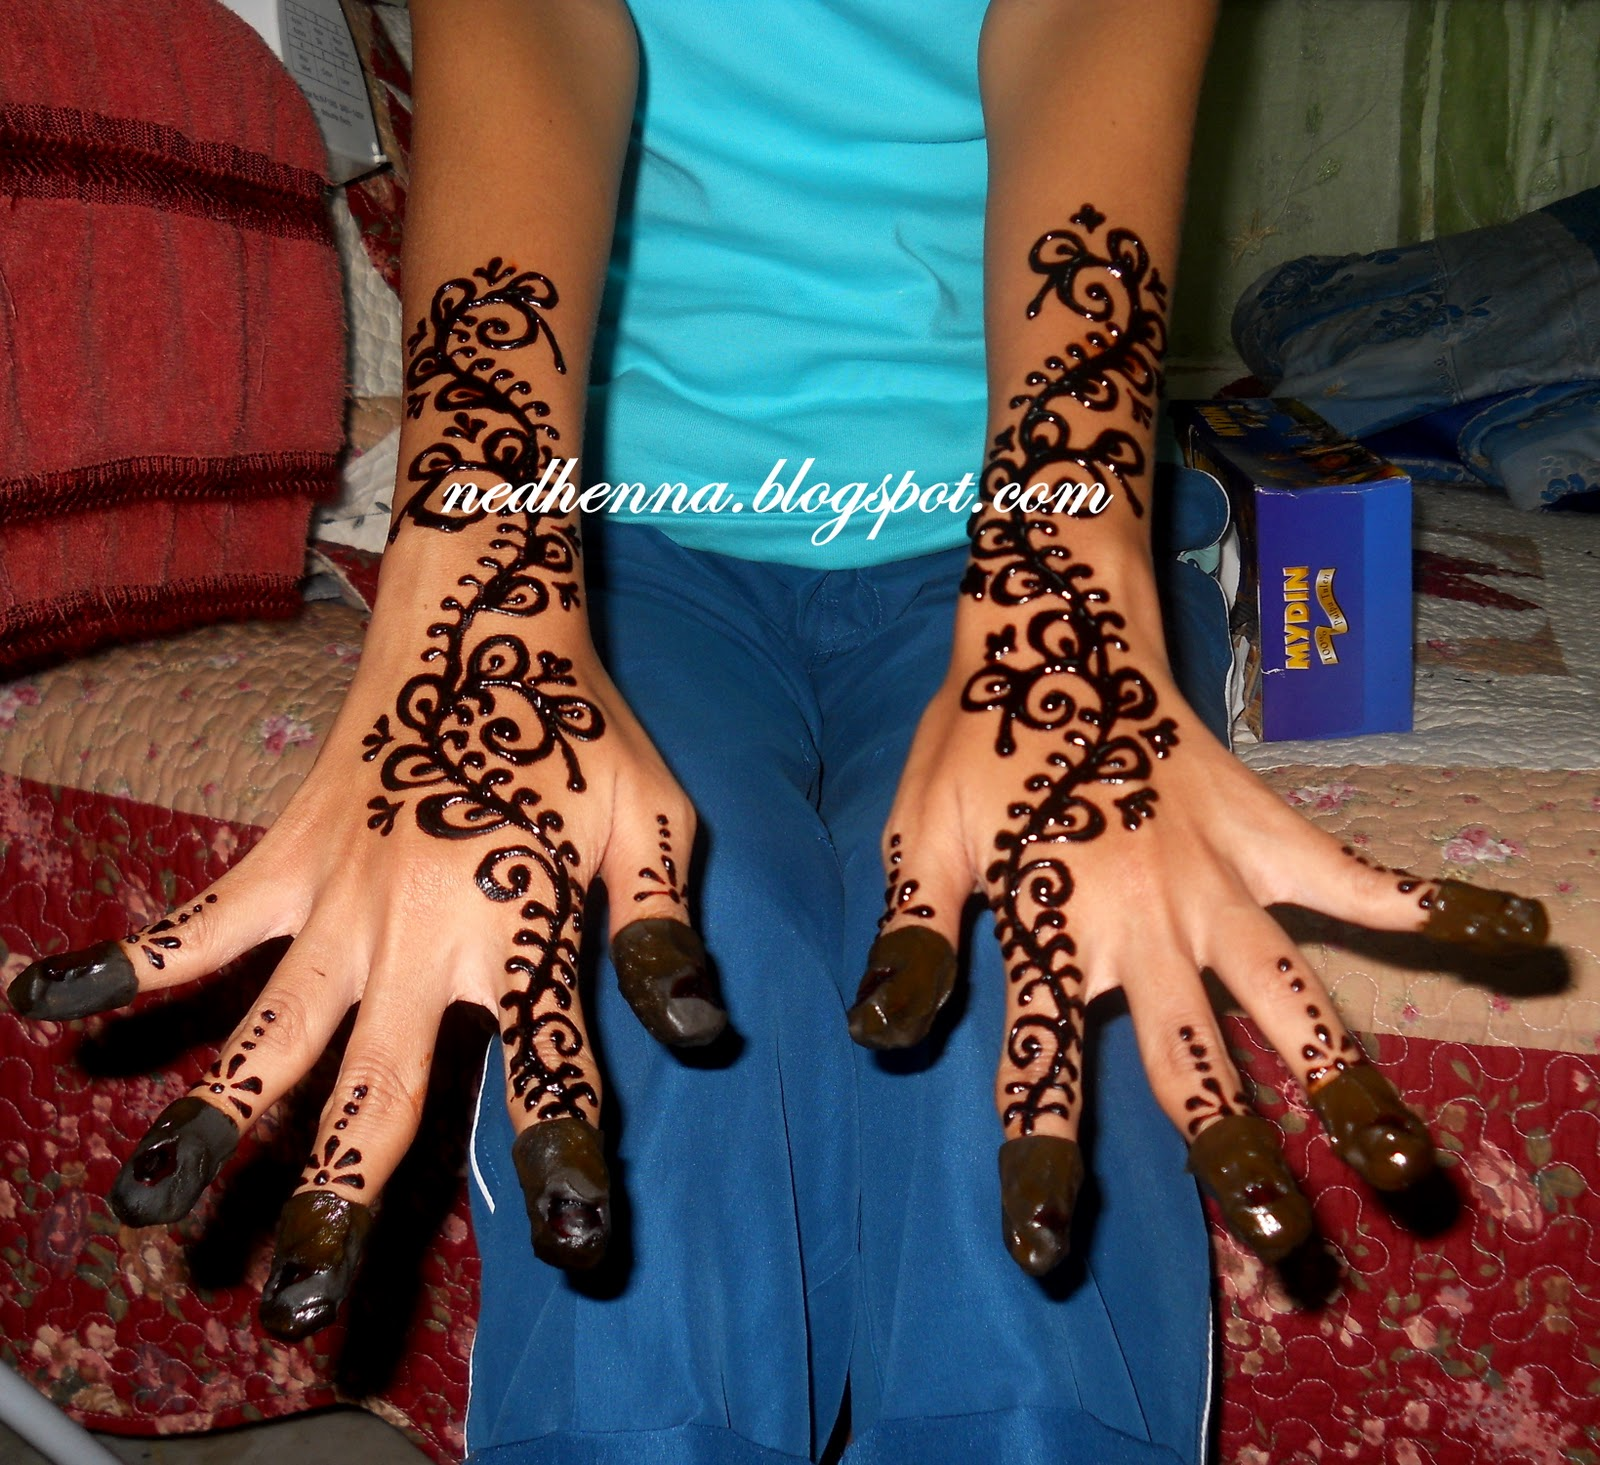 Ned Henna Berinai Nini Wedding Belah Lelaki